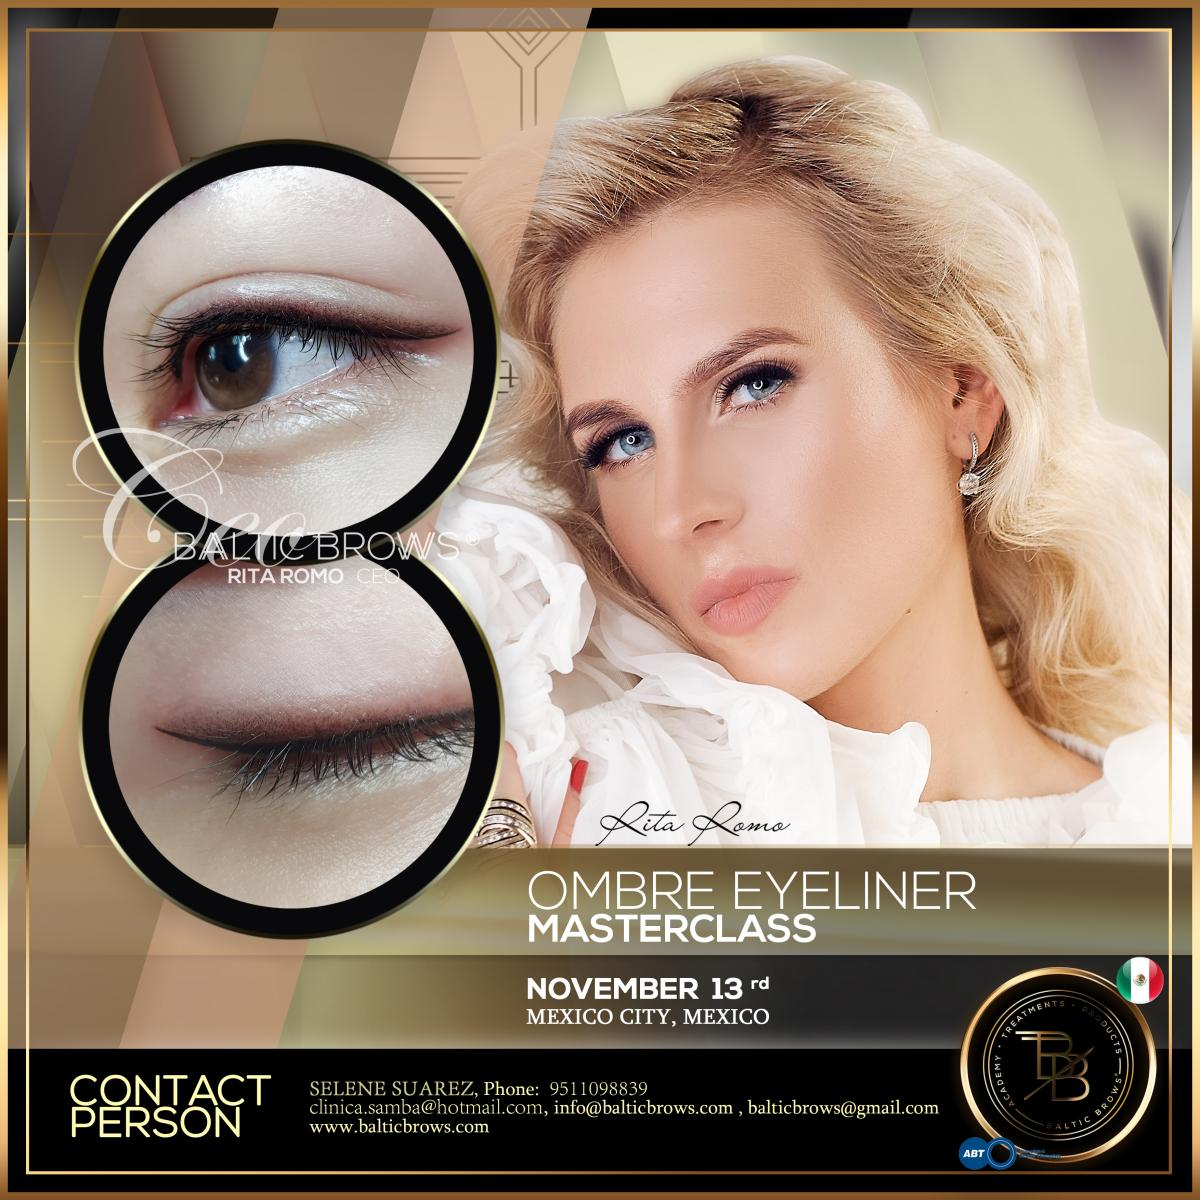 Ombre eyeliner masterclass